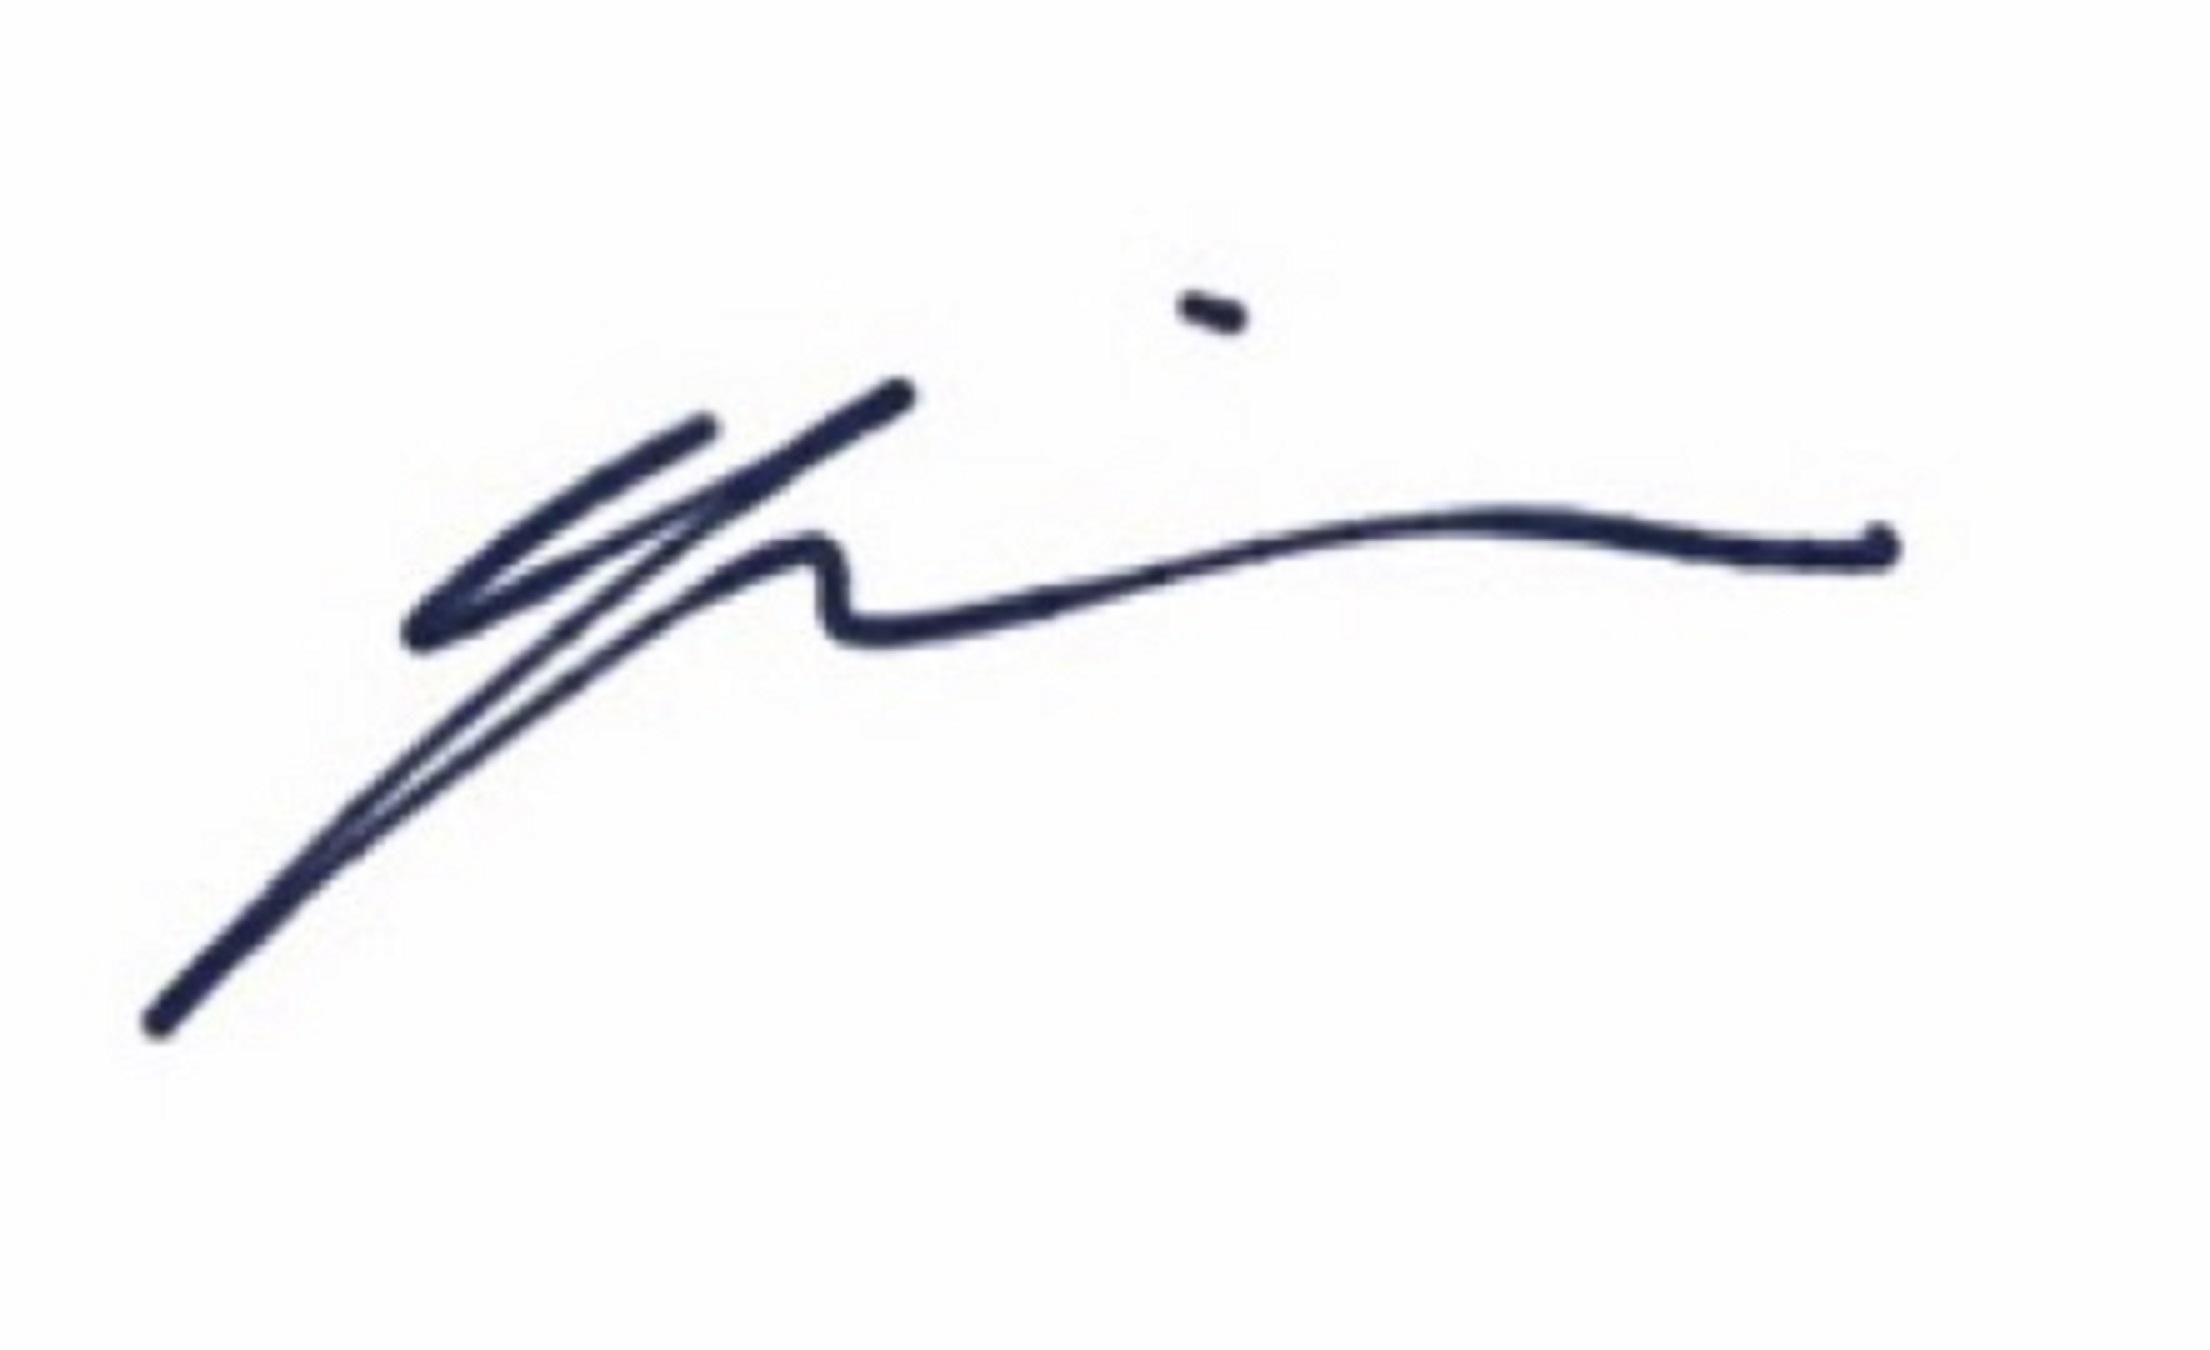 liuyun4's Signature